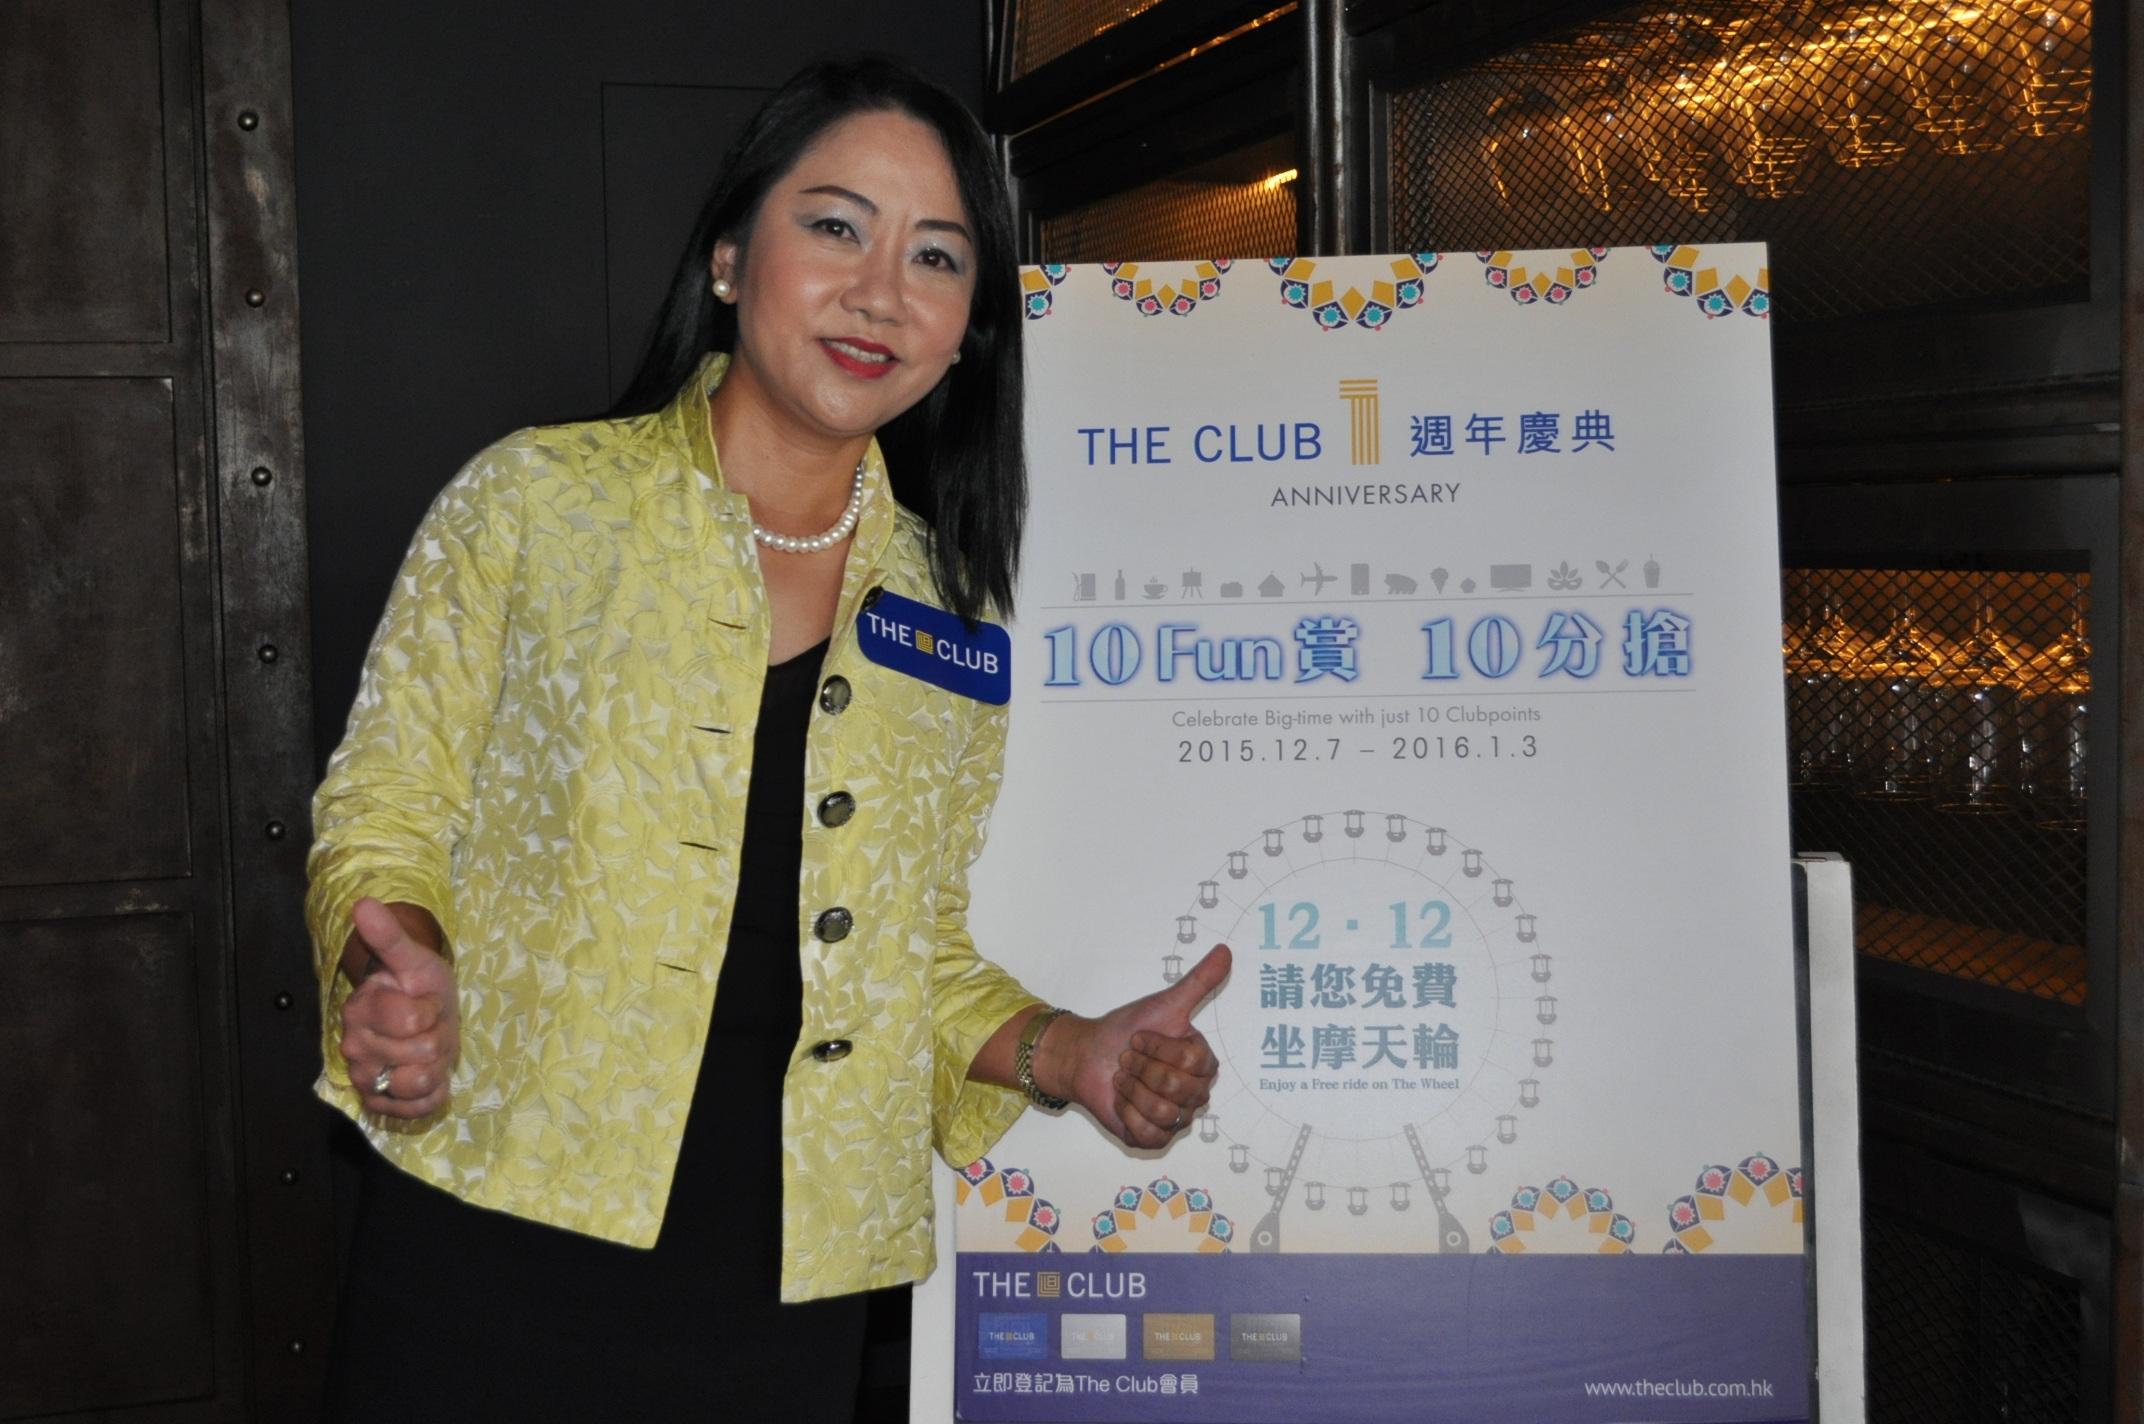 20151118p The Club Anniversary